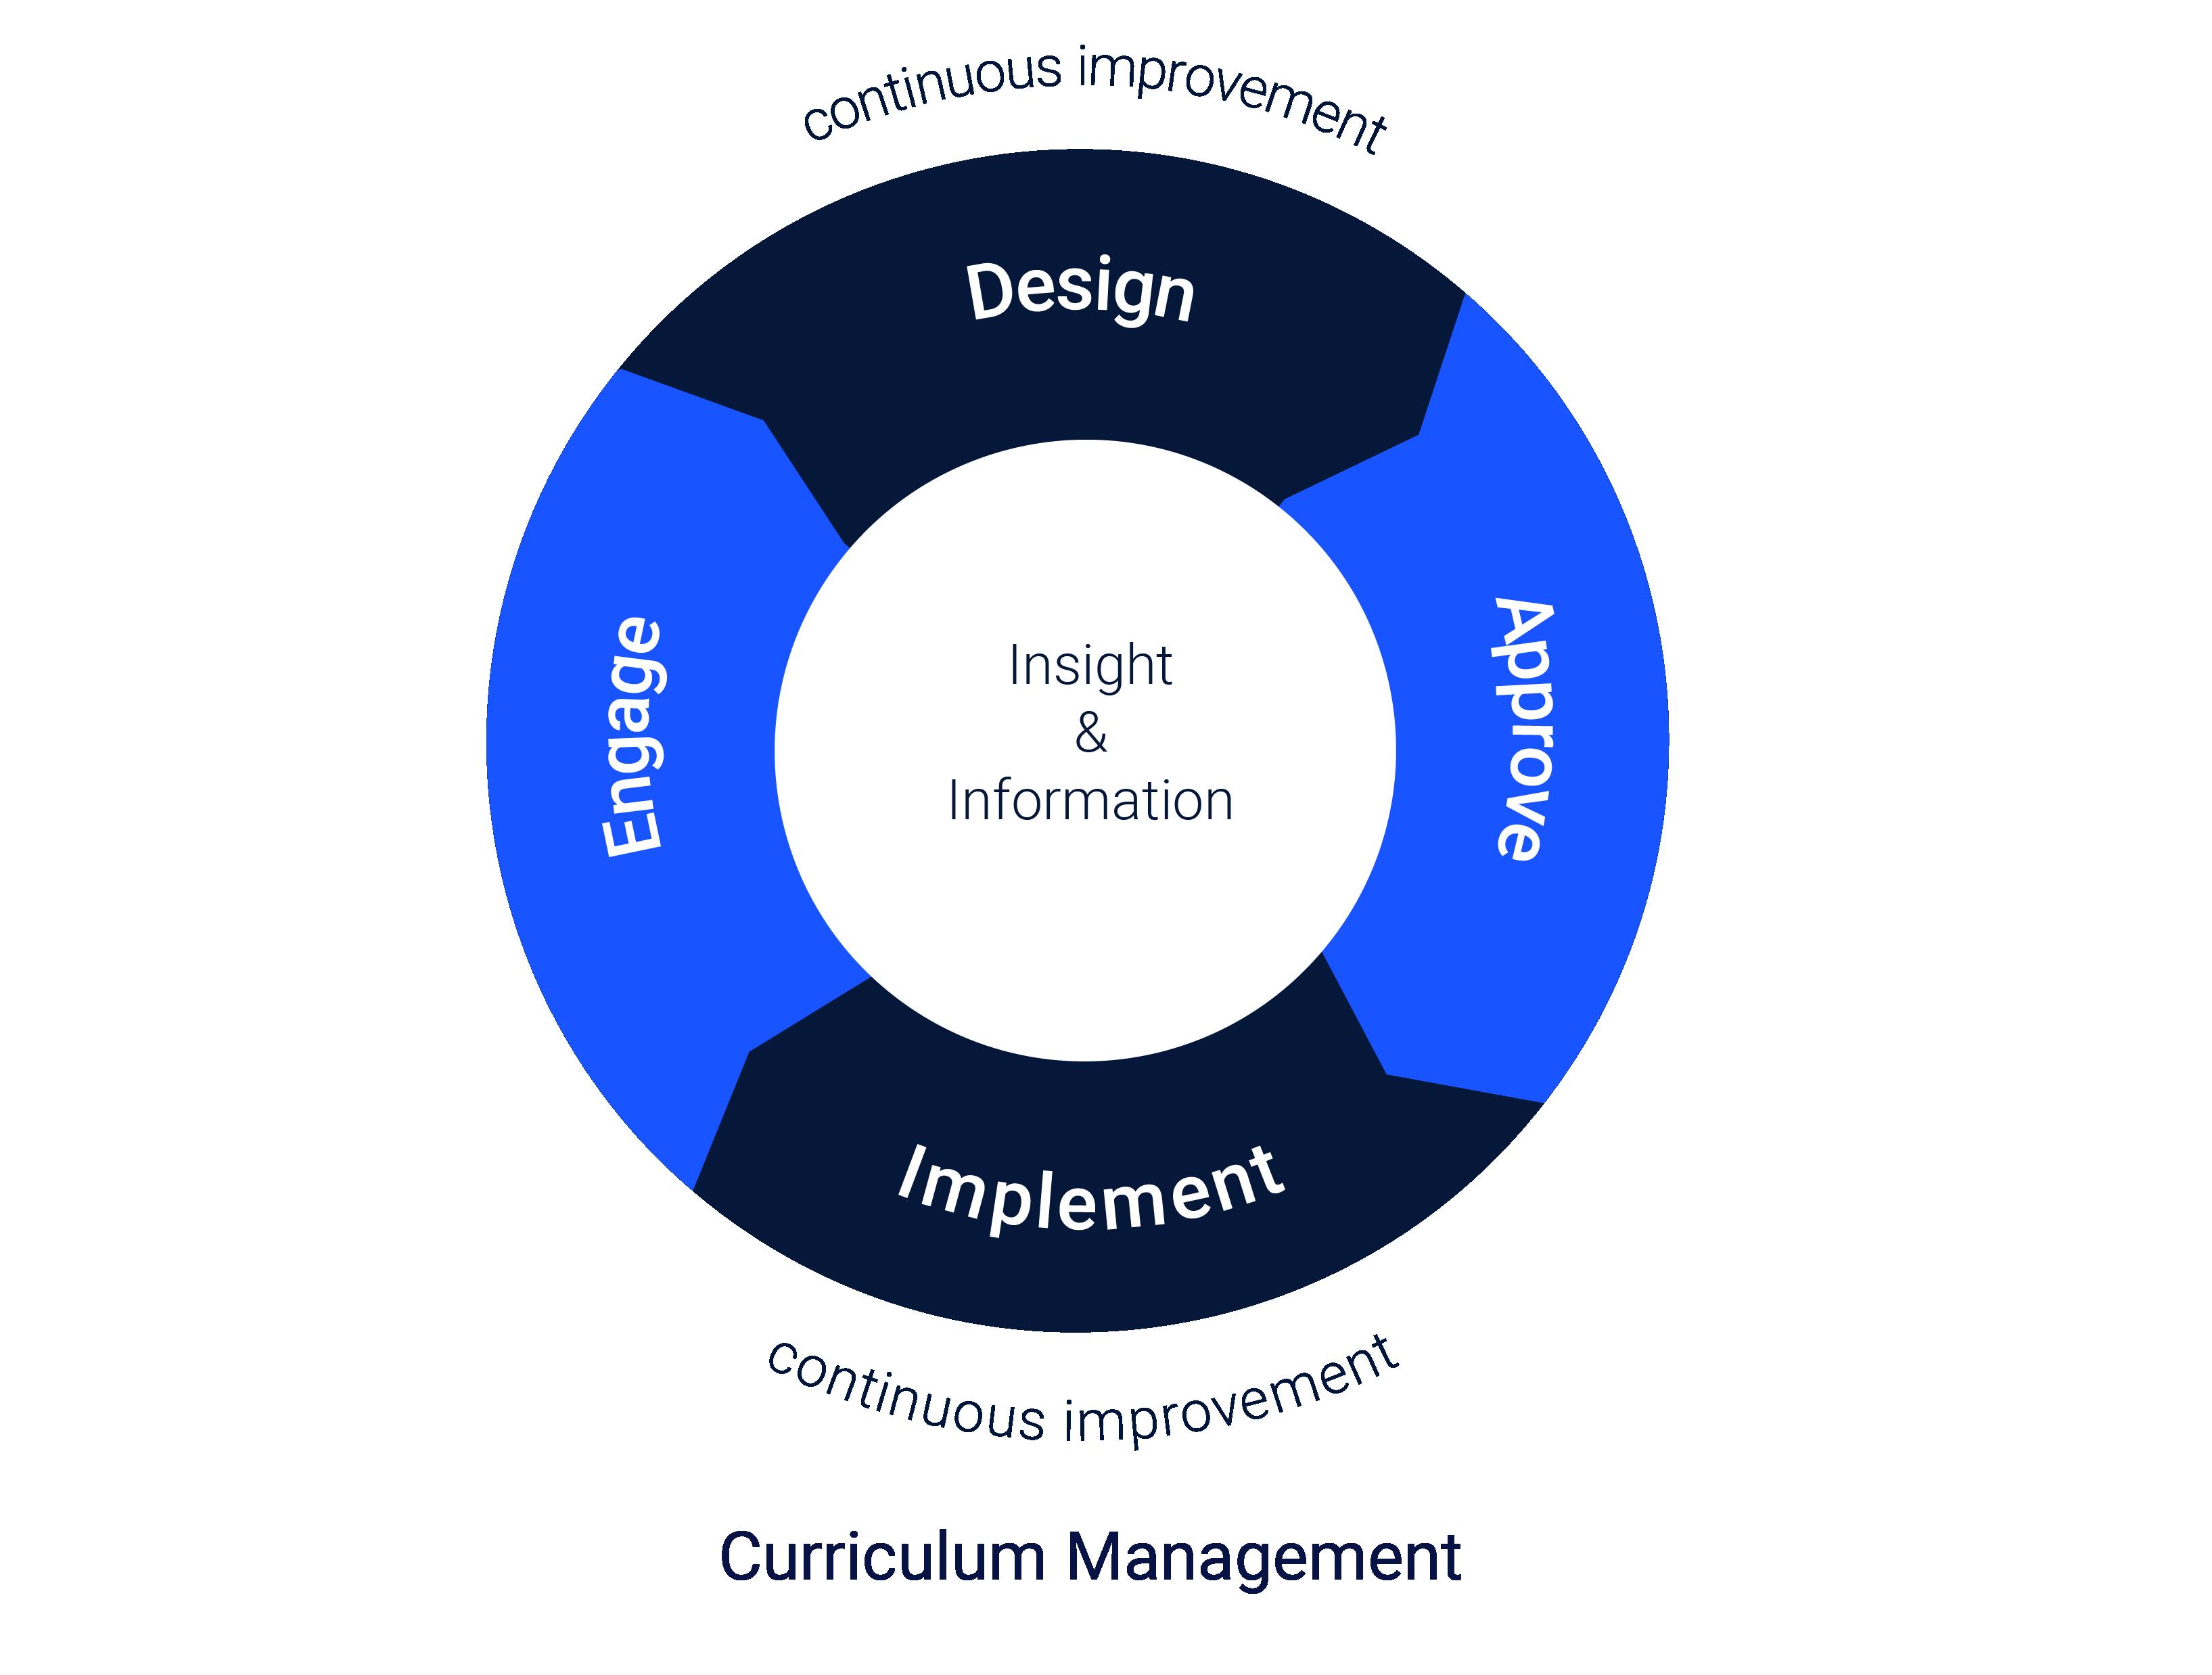 Curriculum Management conceptual model